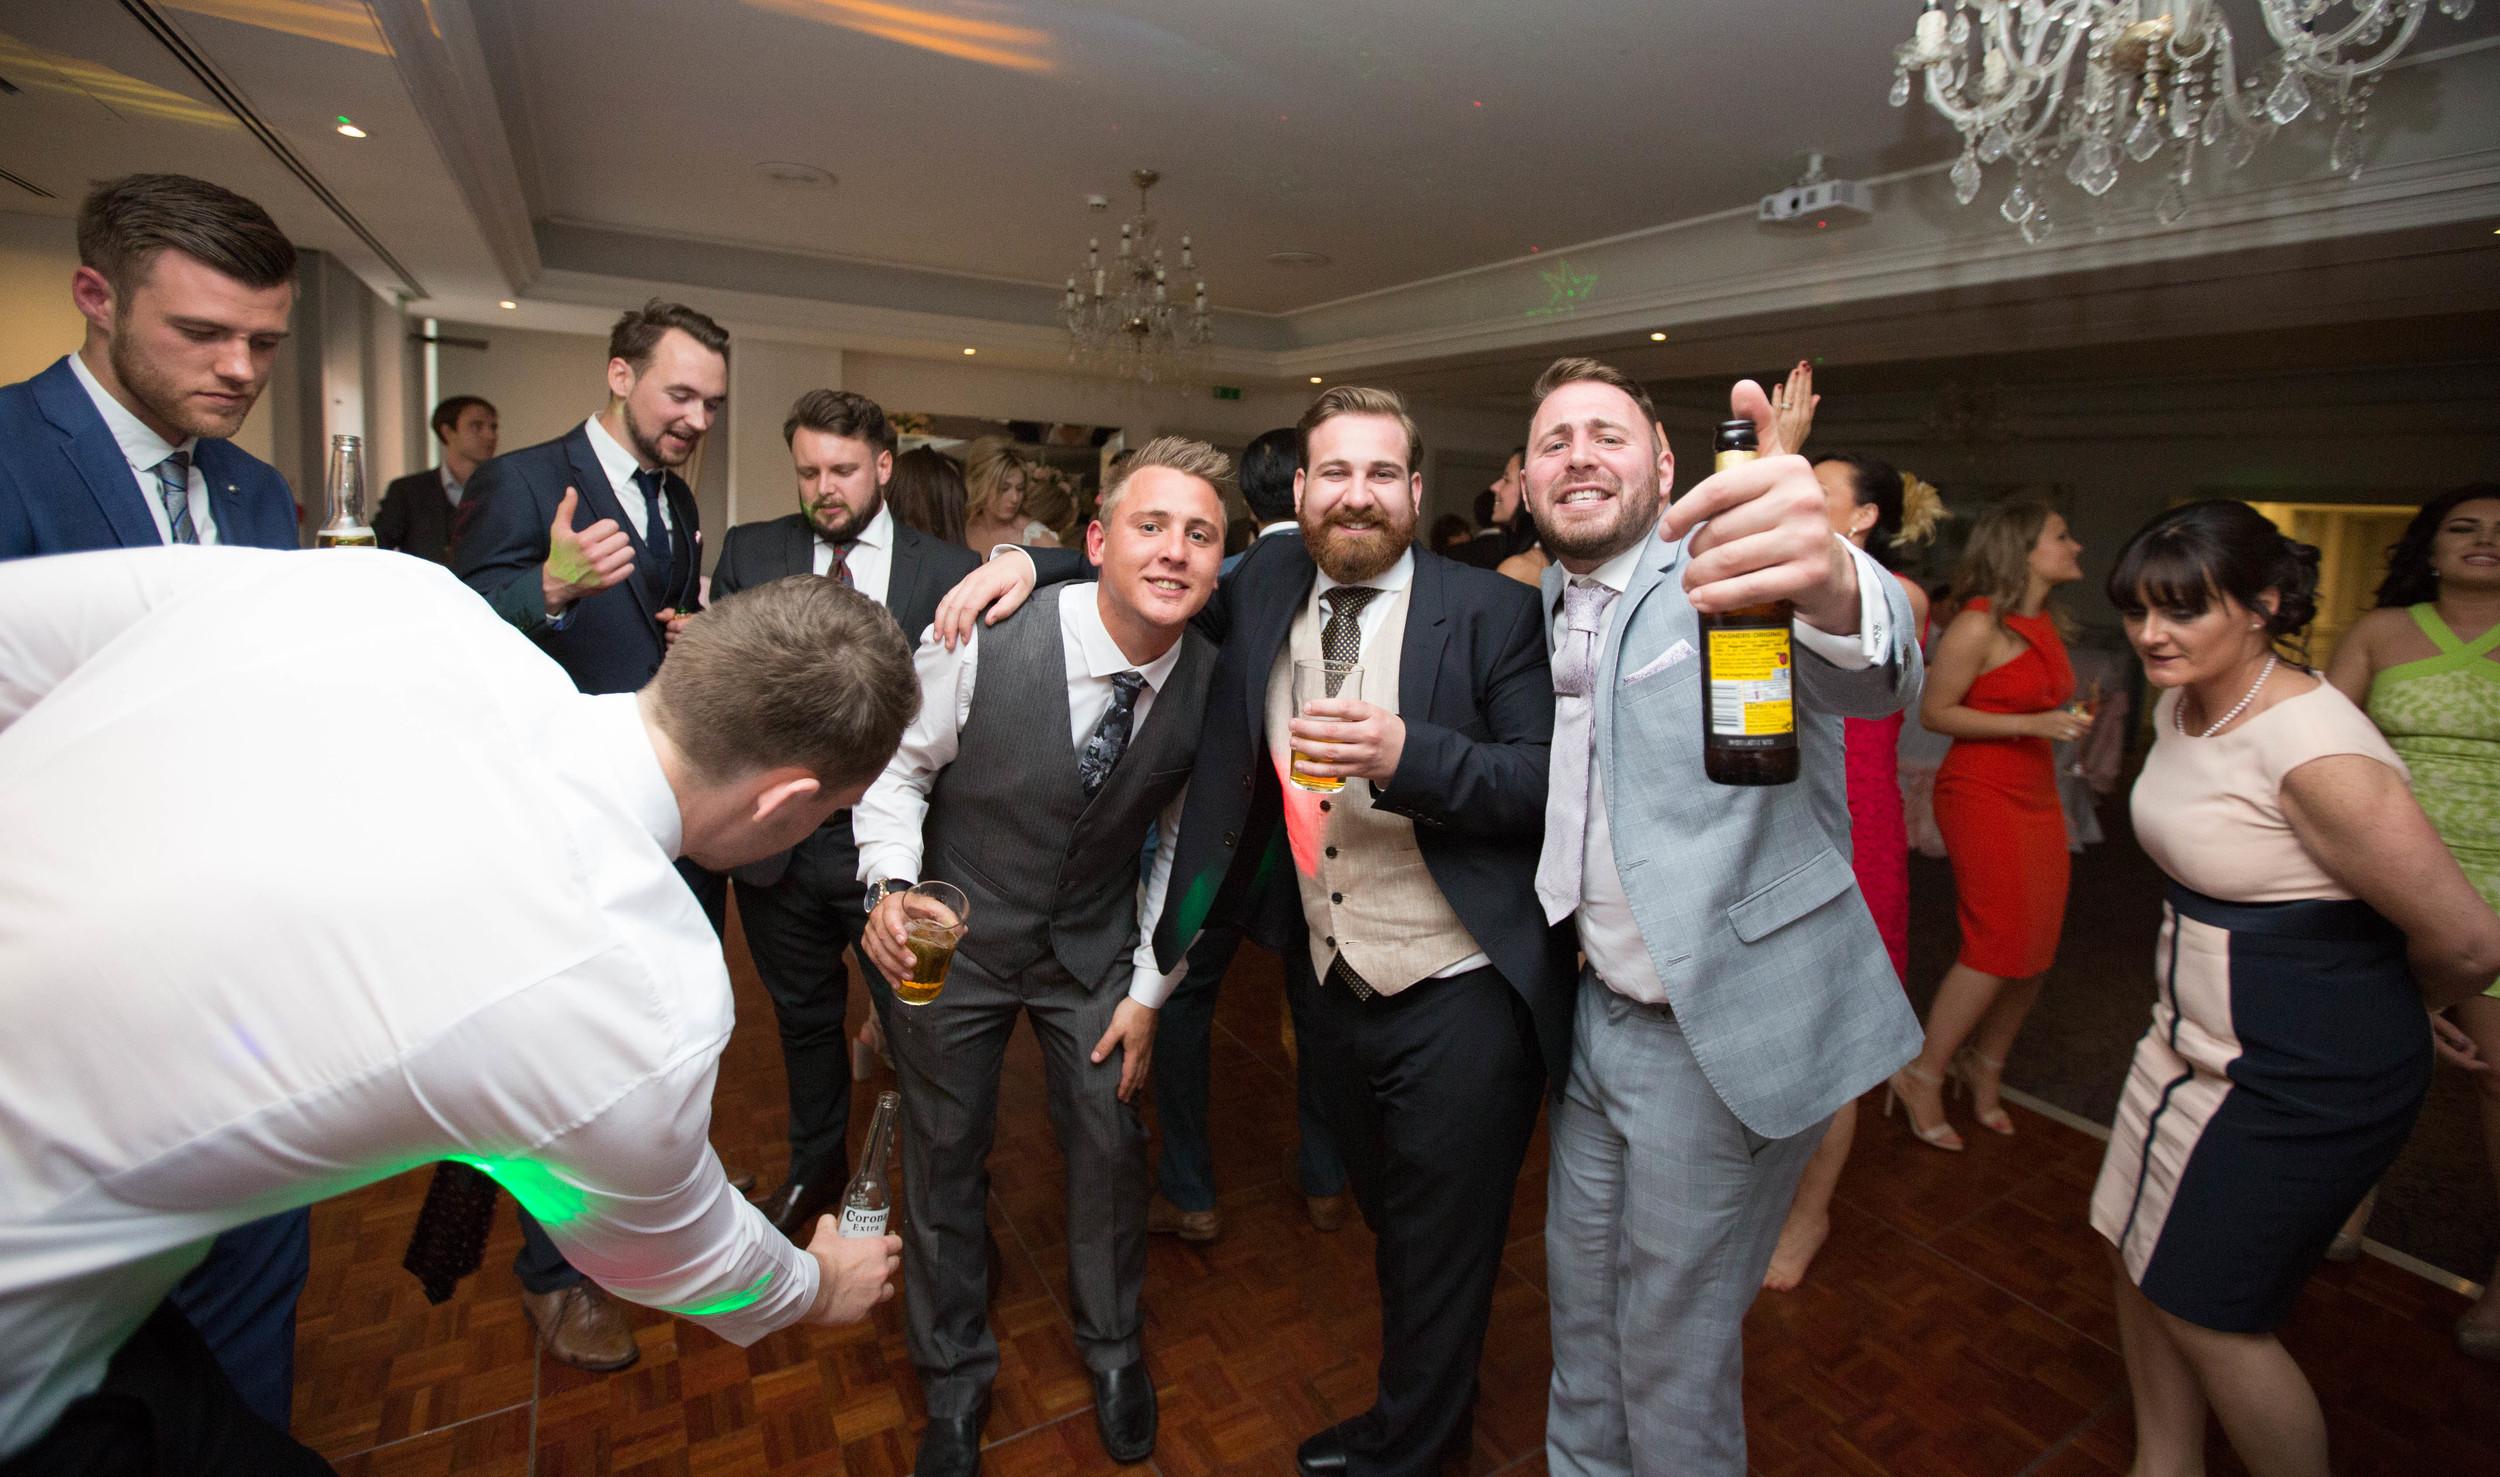 Woodlands-Park-Hotel-Cobham-Surrey-wedding-36